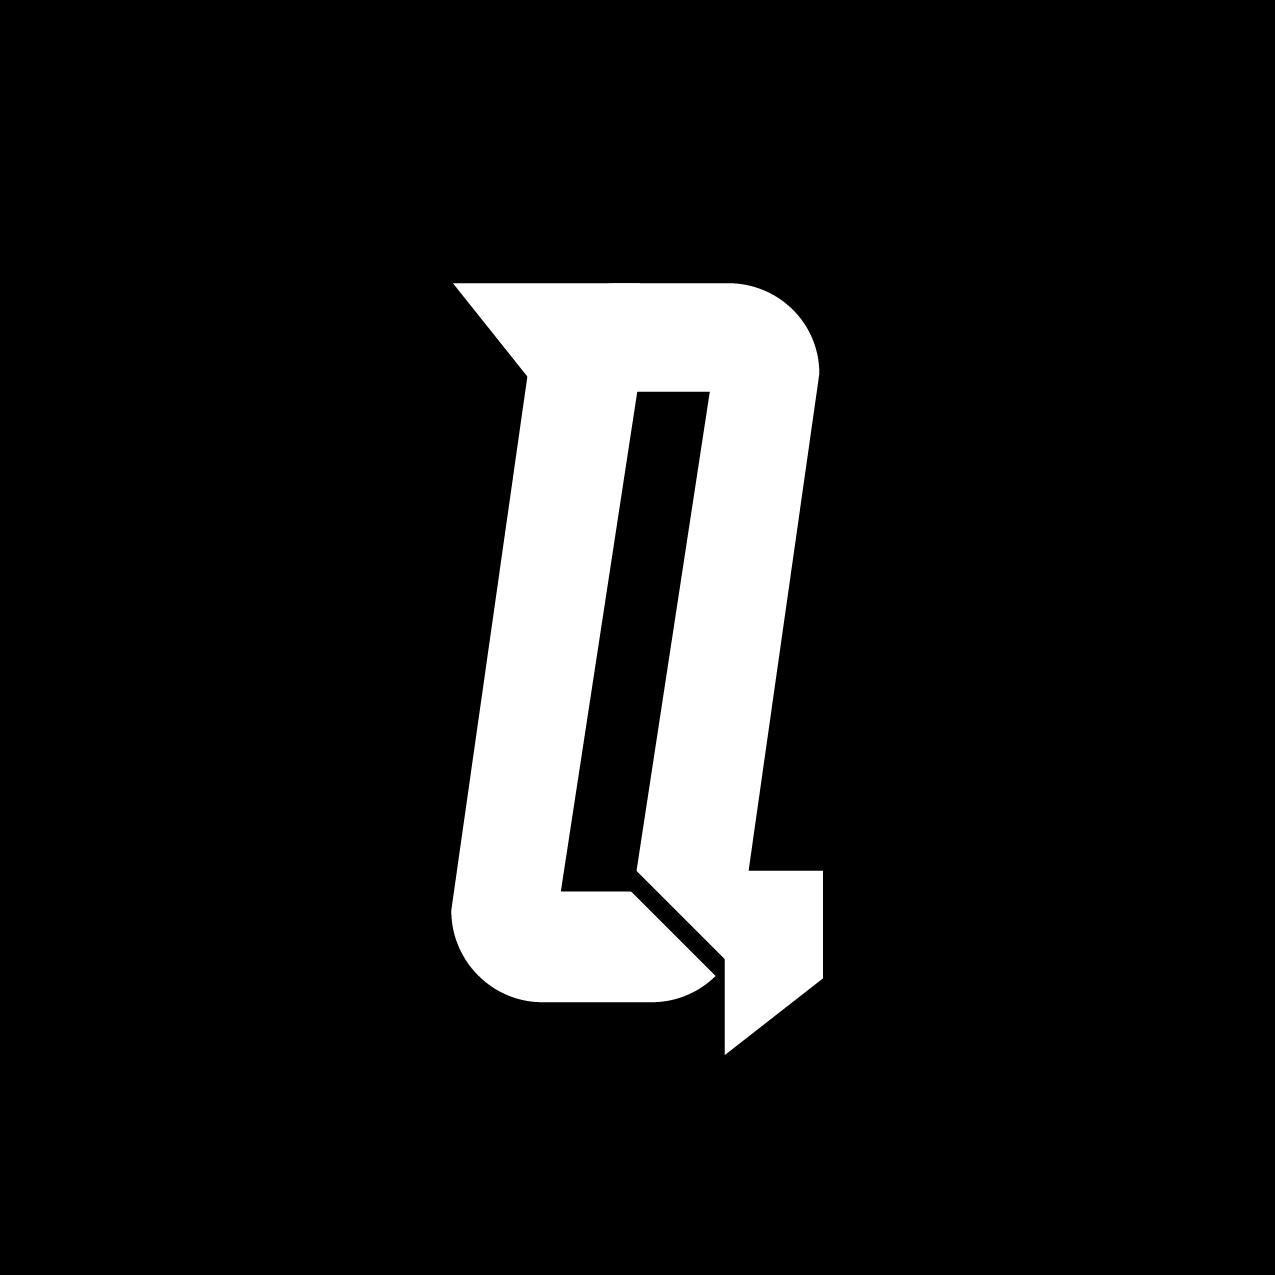 Letter Q12 Design by Furia